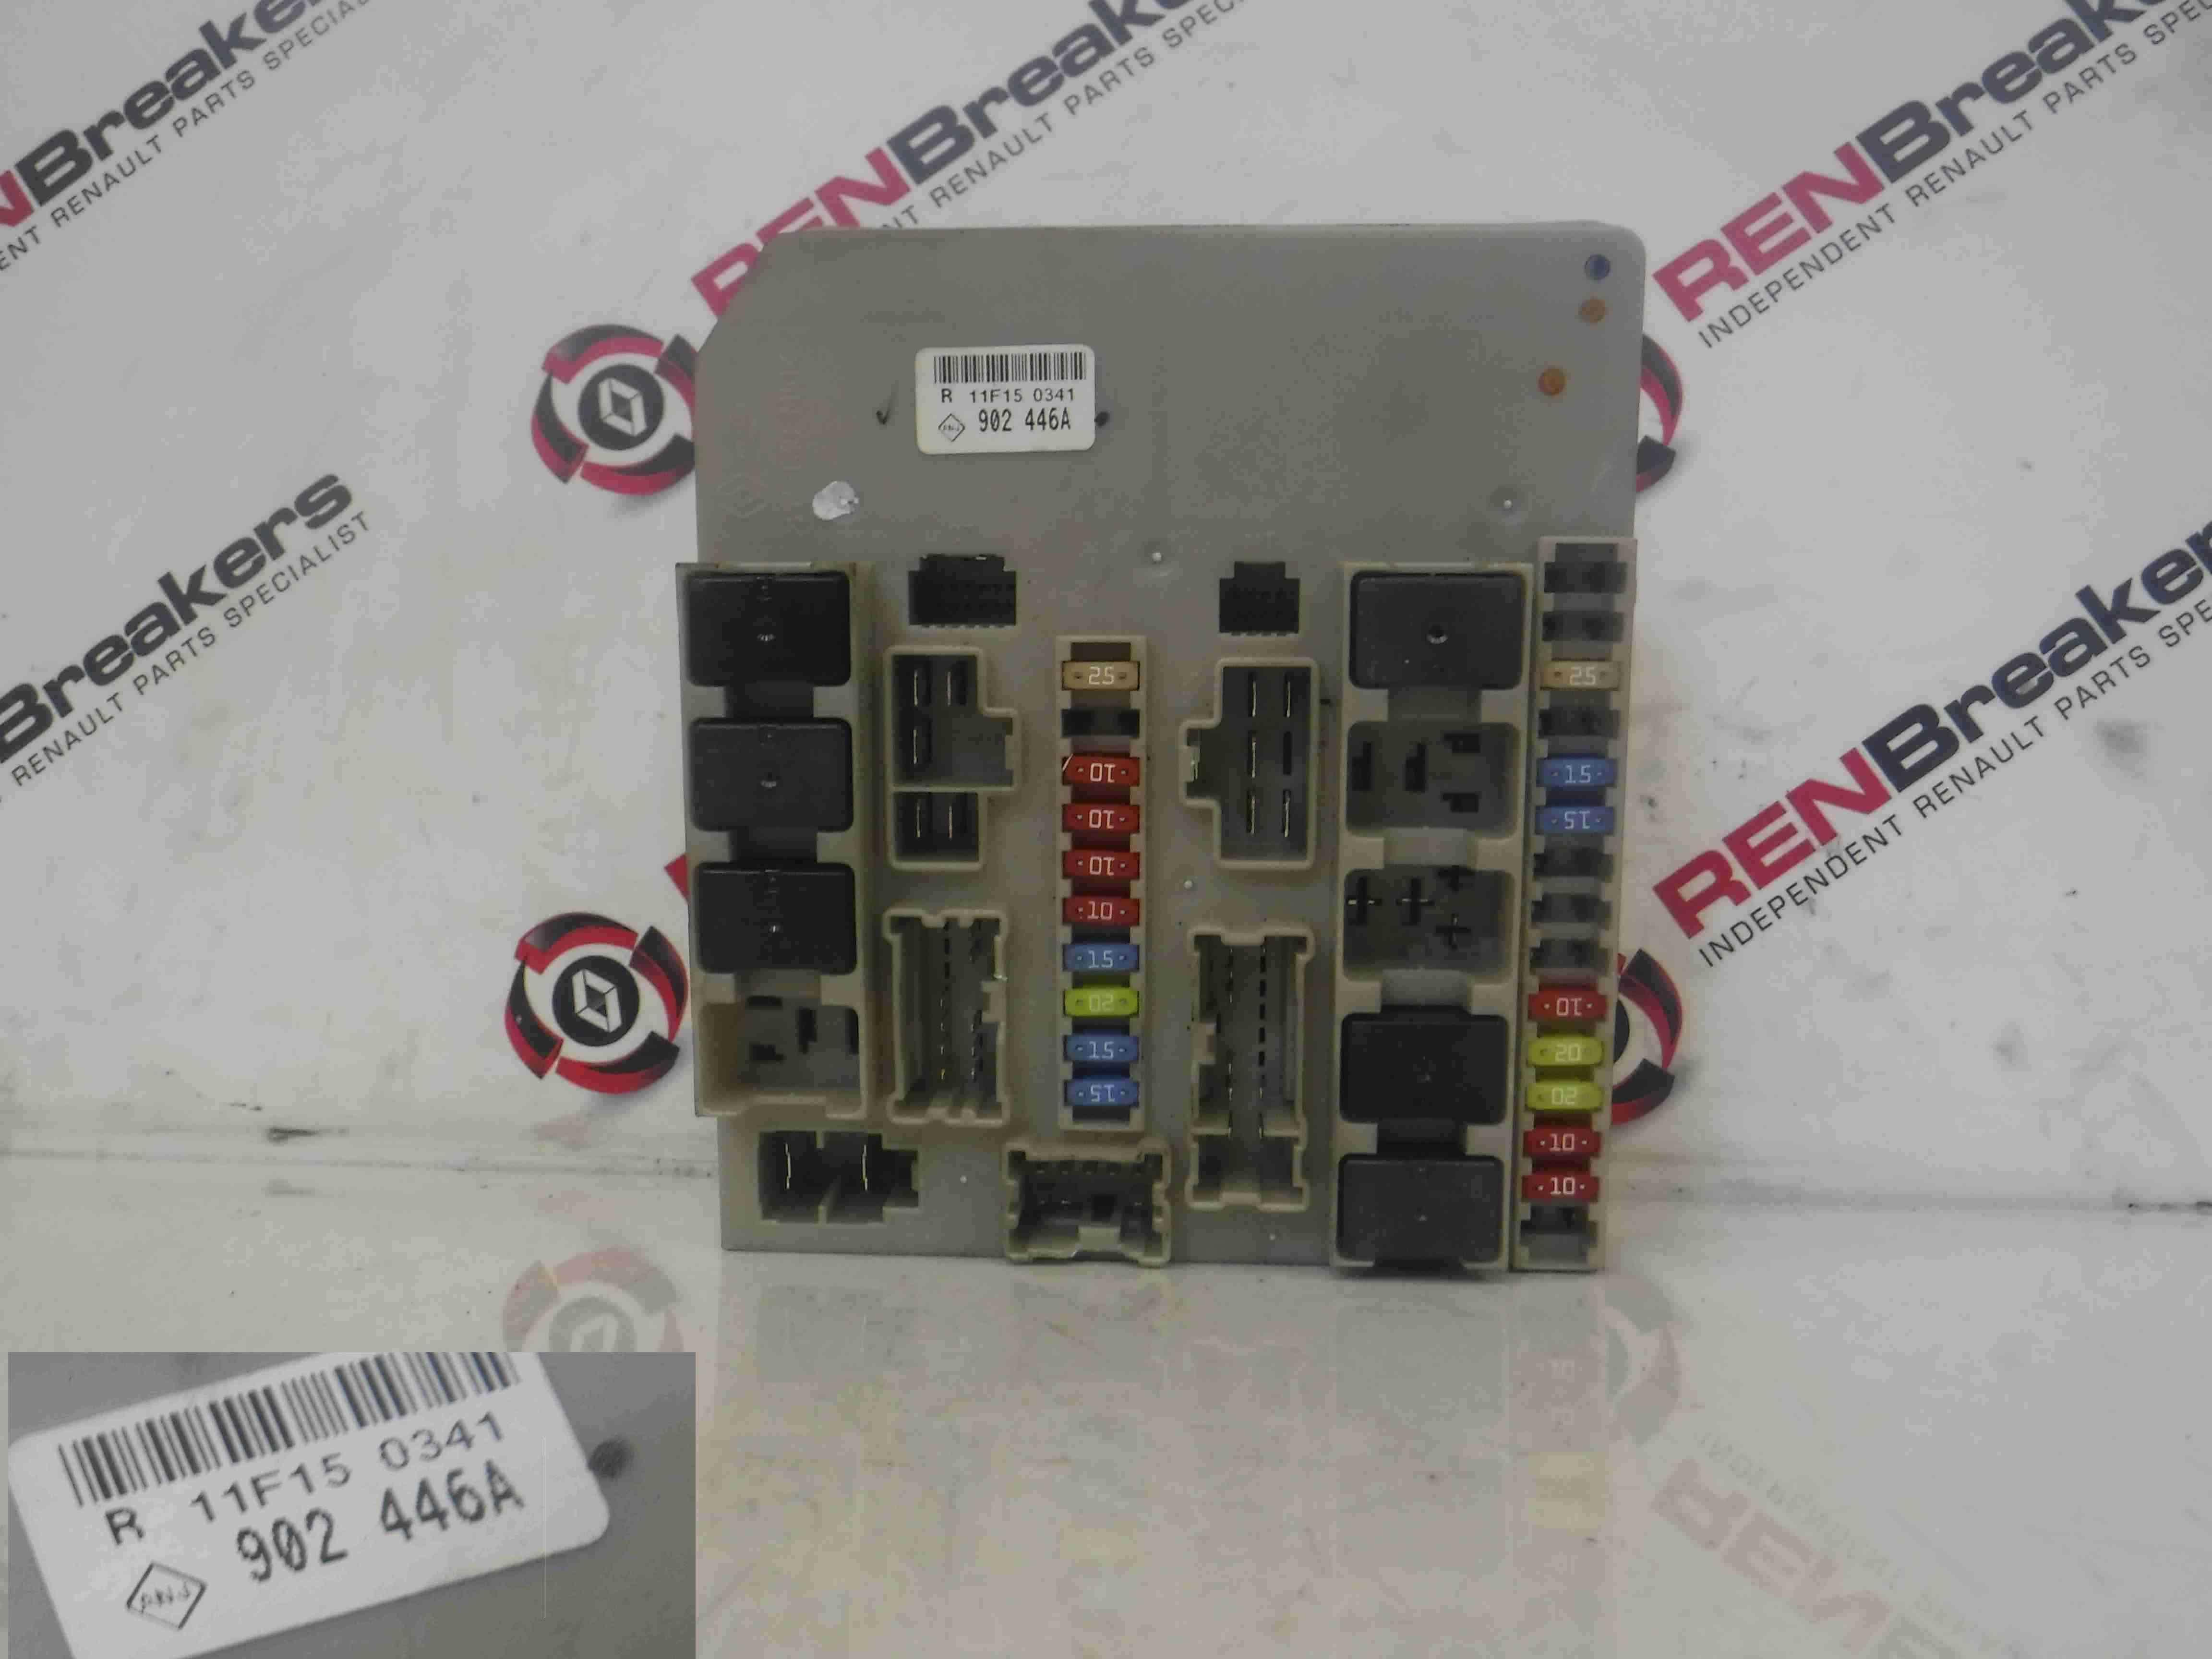 Renault Clio Fuse Box Parts Electrical Wiring Diagrams 2012 Lotus Evora Diagram Trusted U2022